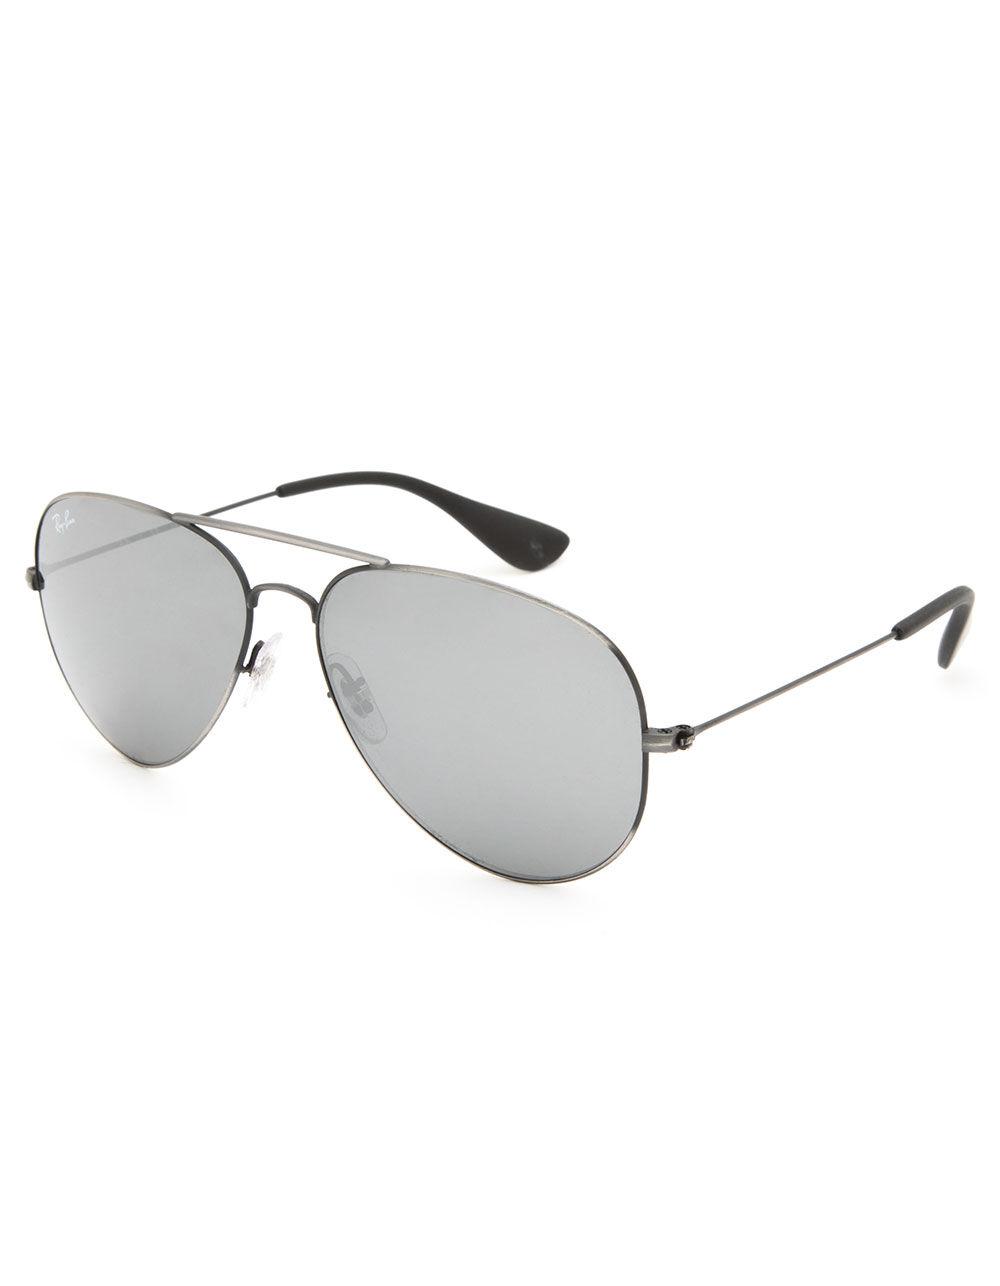 RAY-BAN Aviator Antique Black Sunglasses